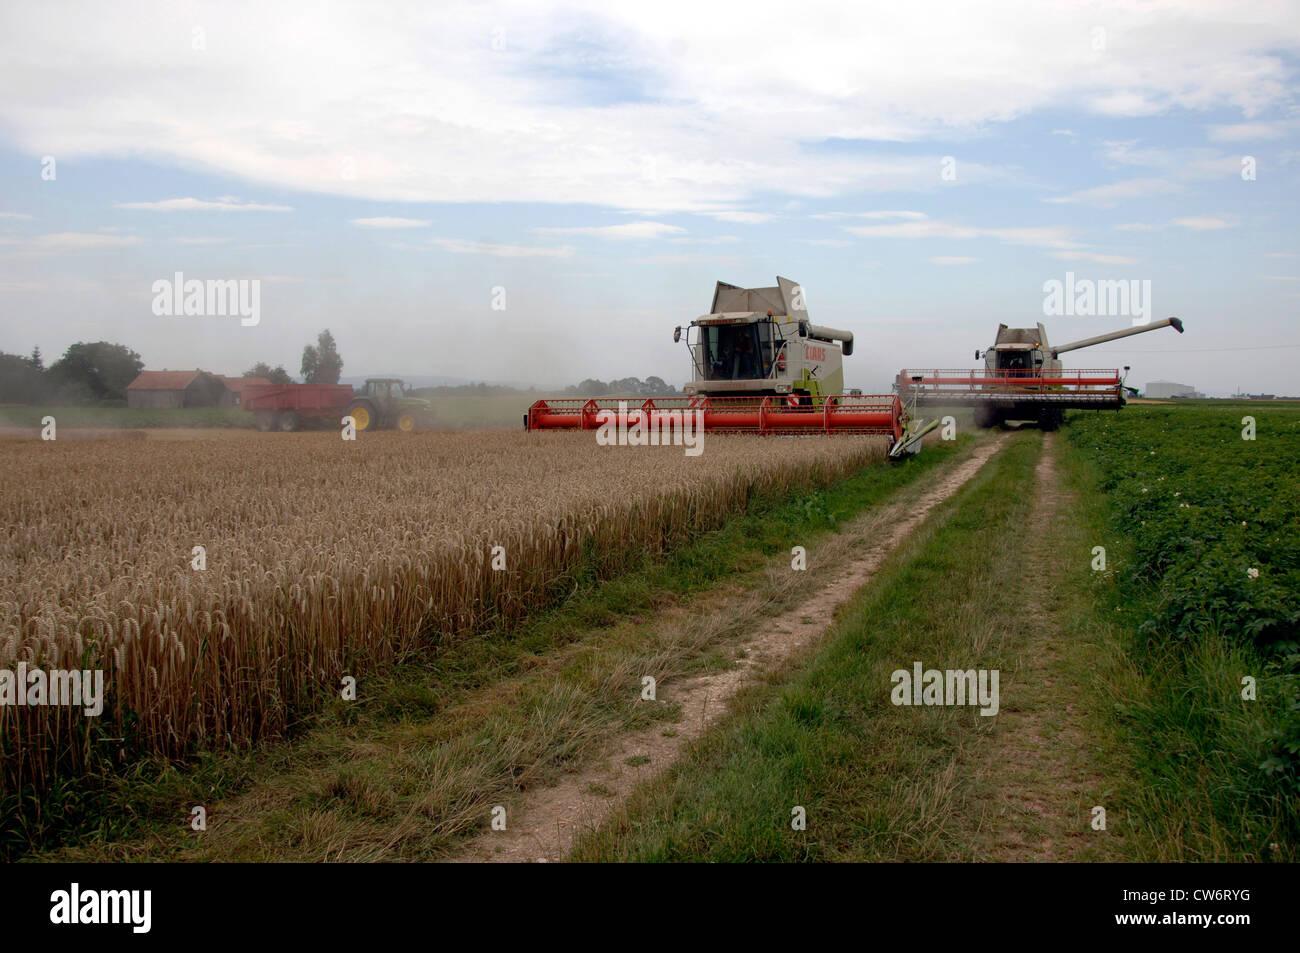 harvester harvesting a wheat field, Germany, Bavaria - Stock Image